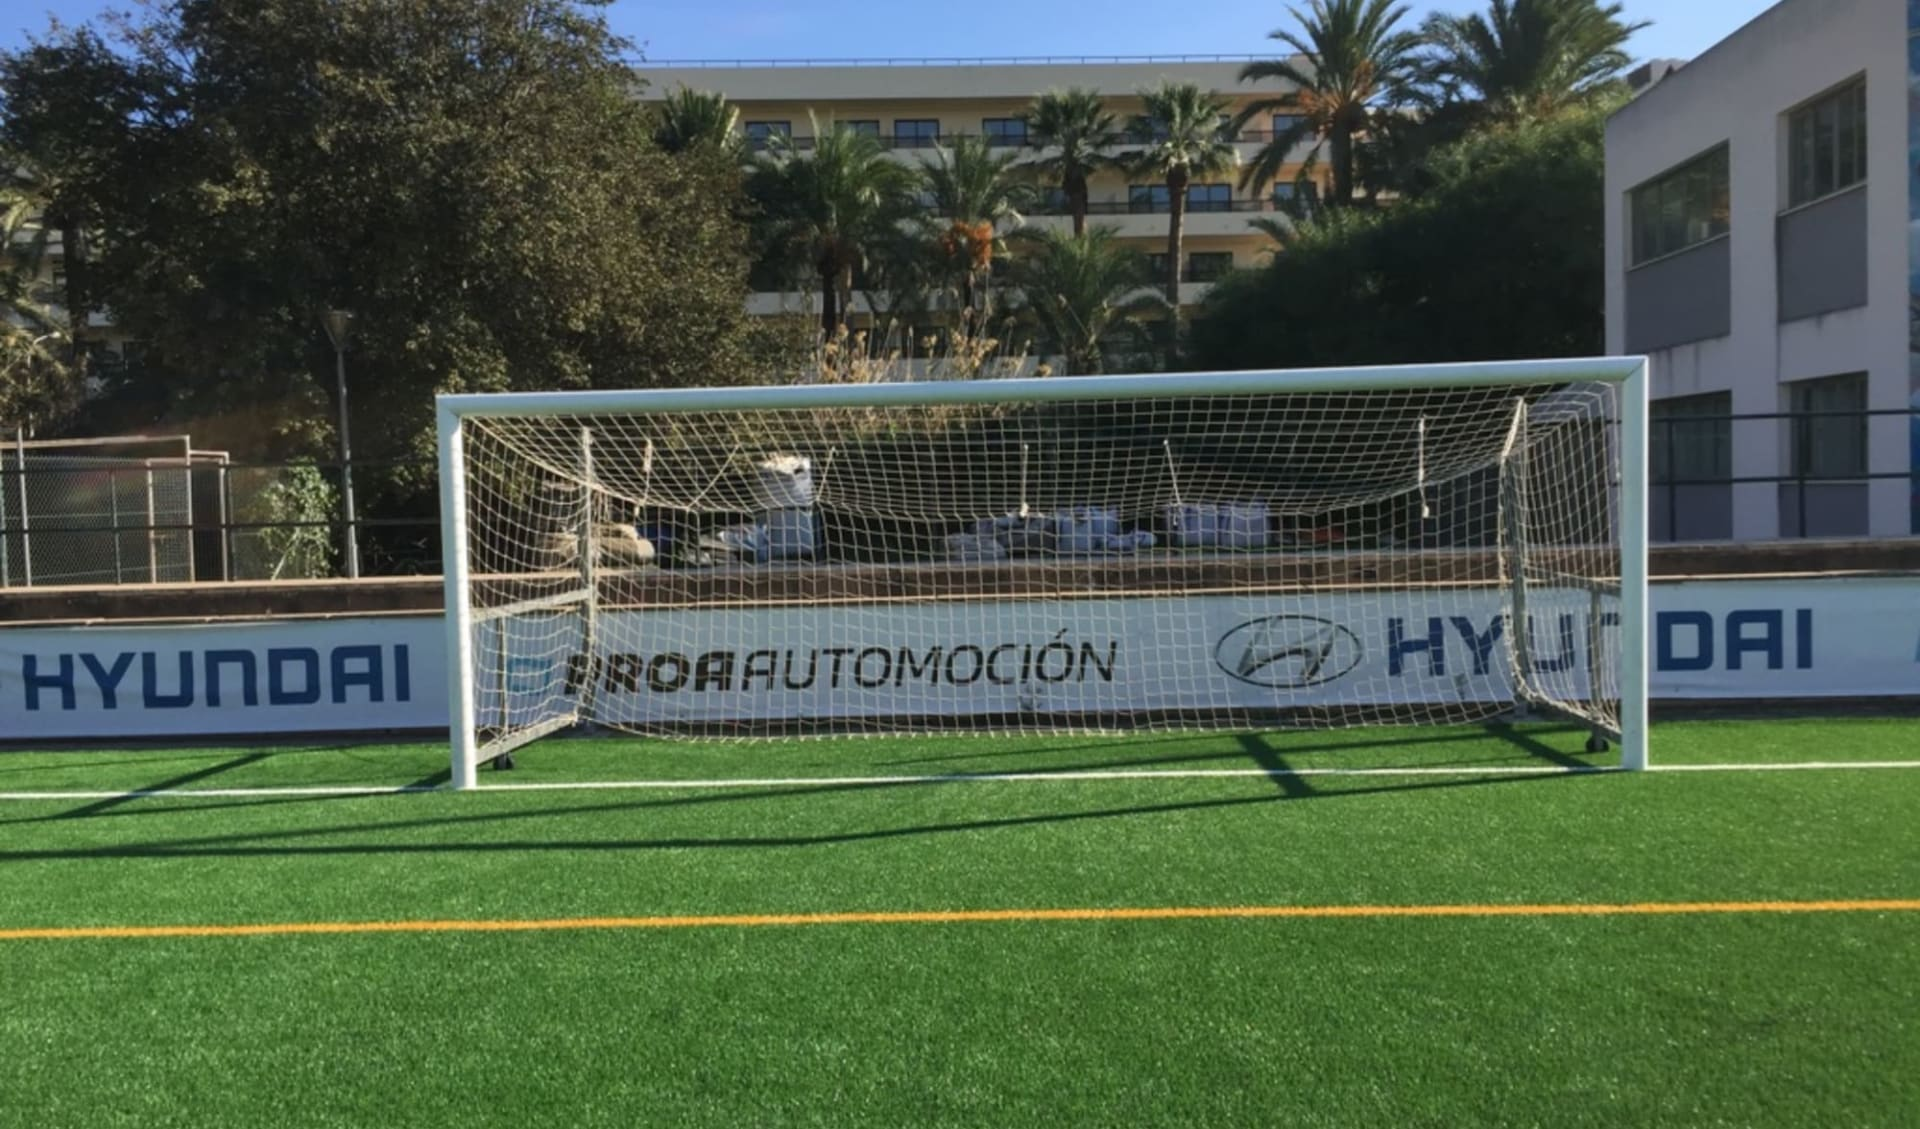 Mallorca - Hotel Zafiro Don Jaime: A2_PMI - SANTA PONSA ARTIFICIAL FOOTBALL PITCH 16